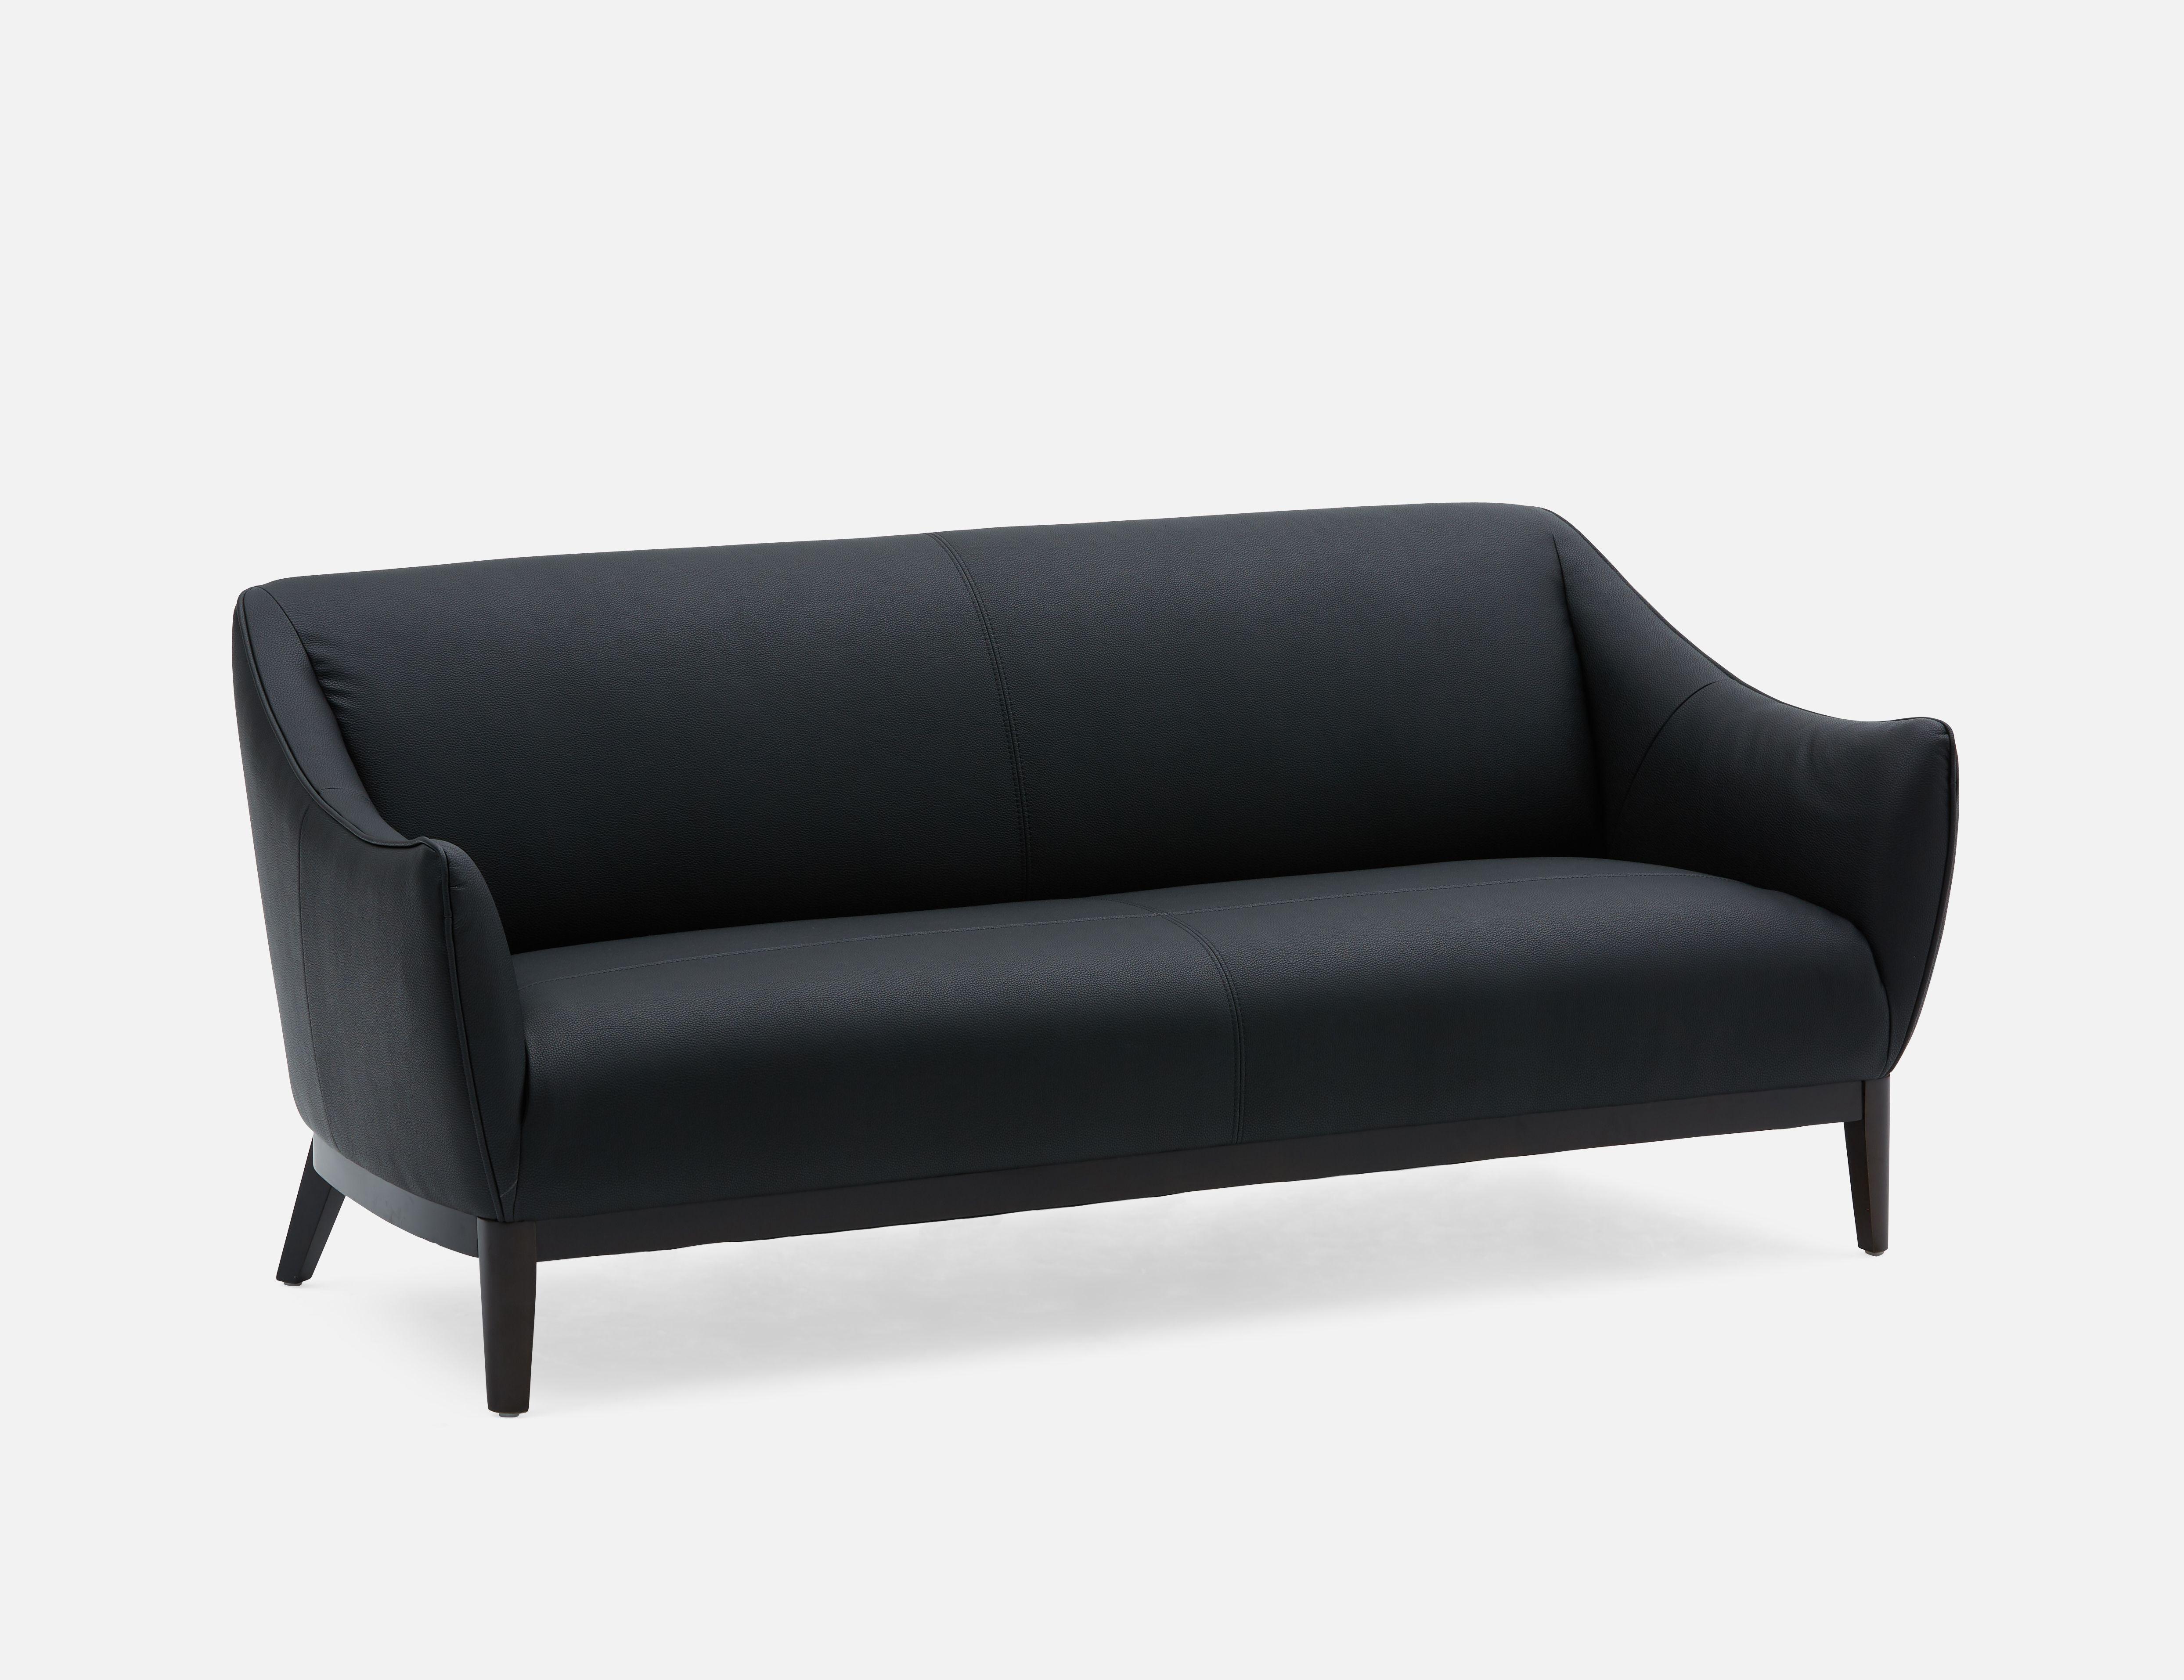 Black 3 Seater Sofa Structube Noah Sofa Modern Sofa Three